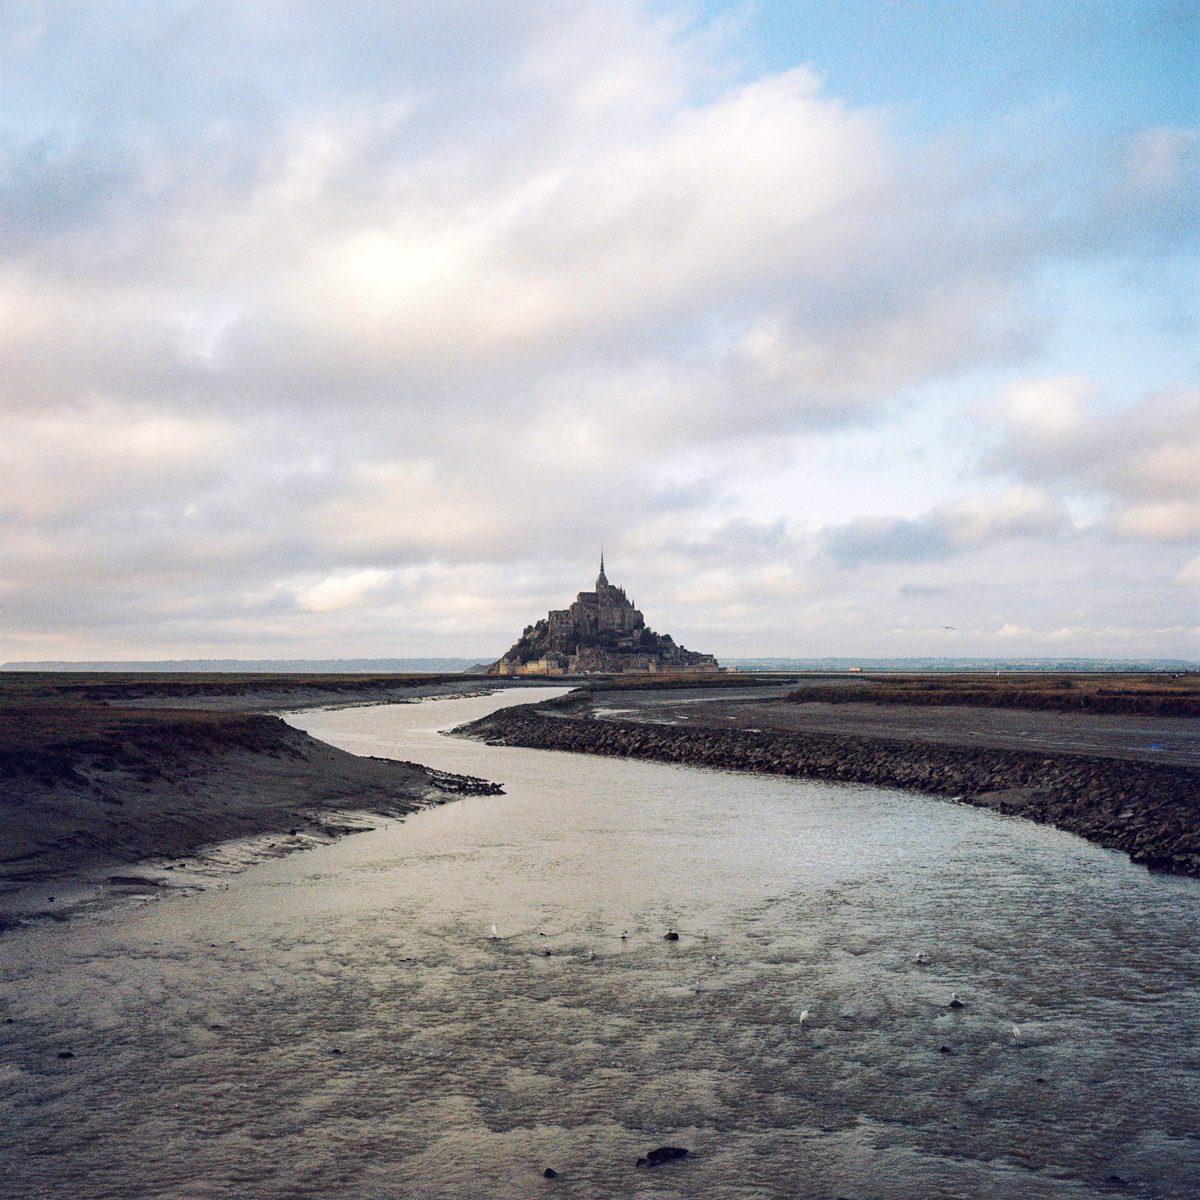 Dinan | Mont San Michel, 2020 – Portra 800 (120), Yashica Mat 124G